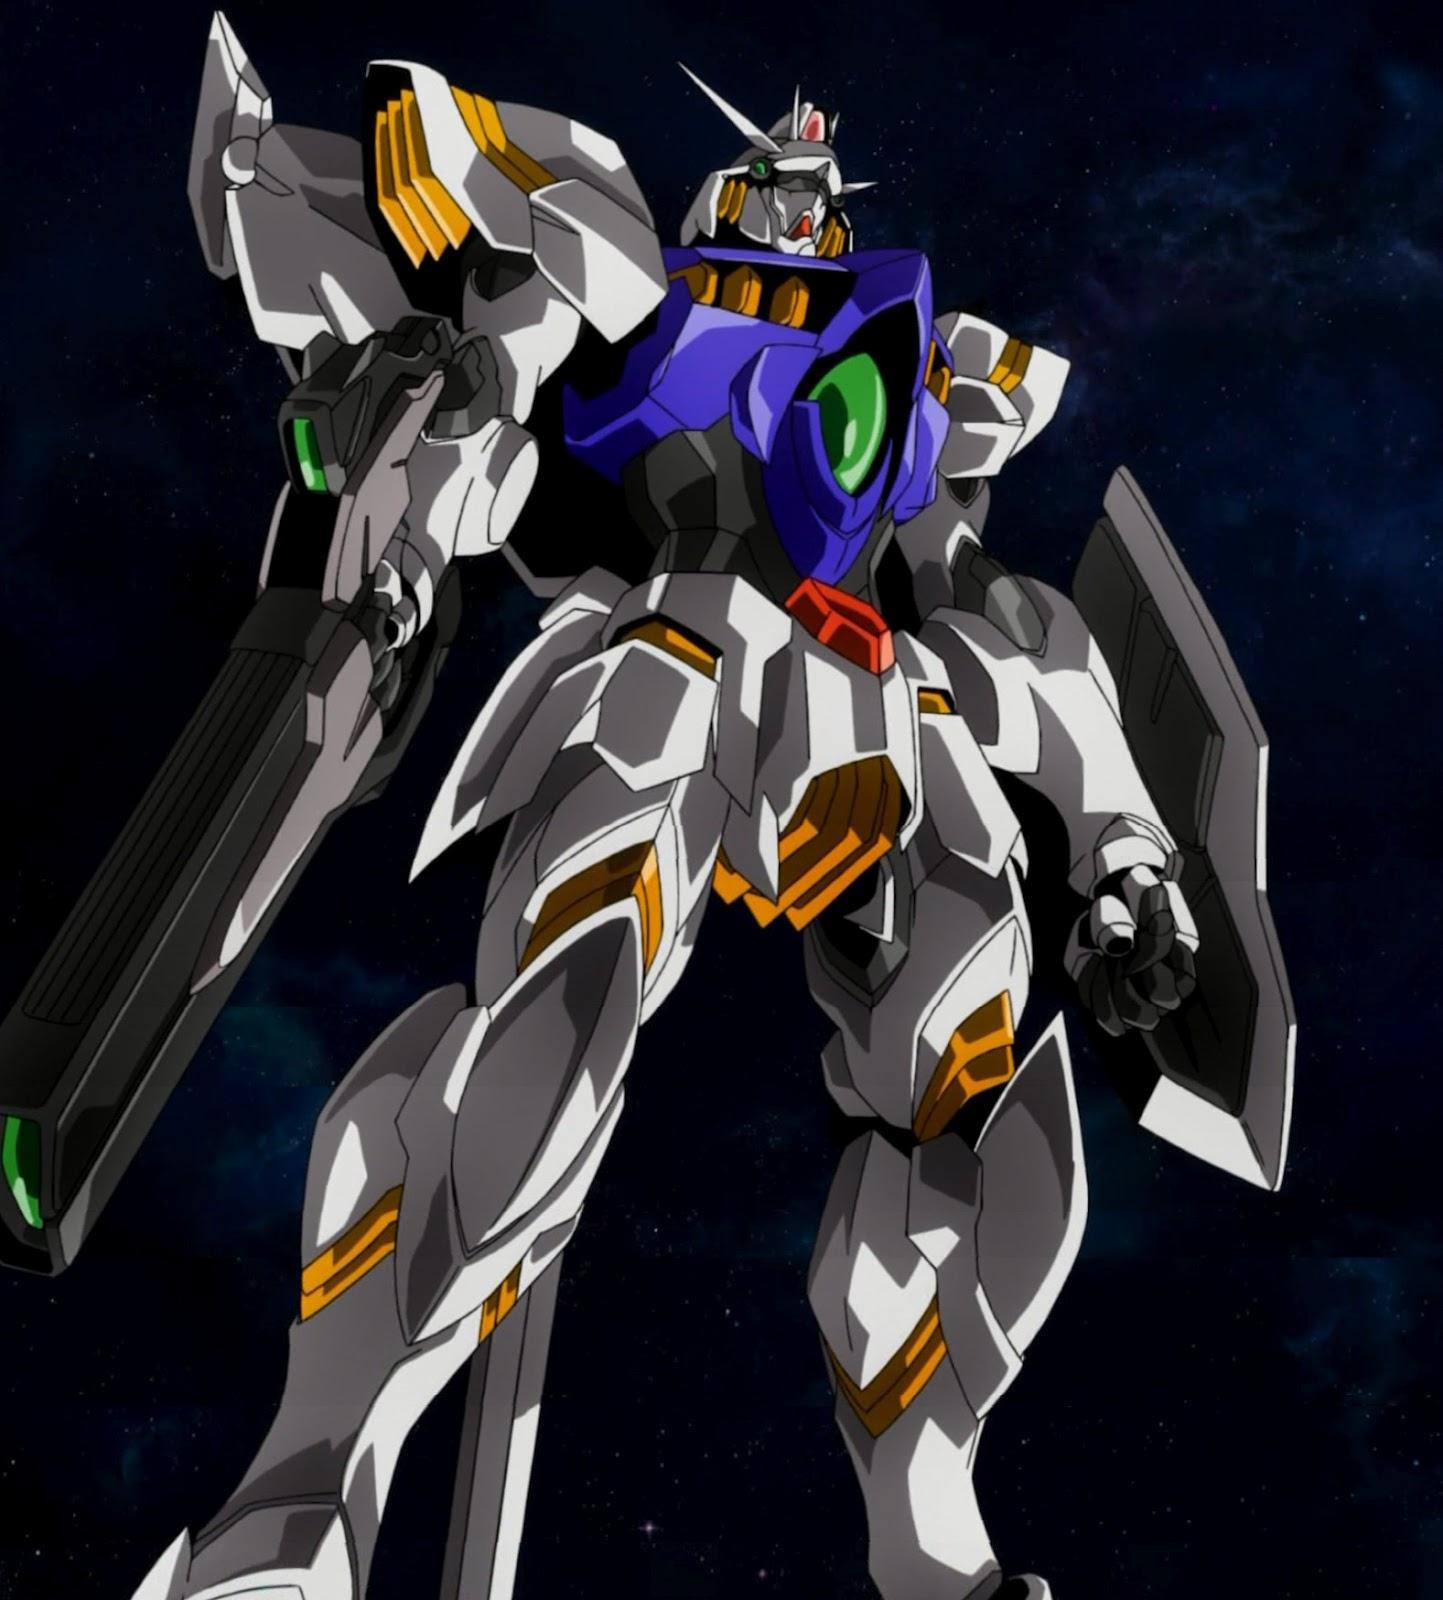 Gundam Guy Gundam Legilis Wallpaper Size Images